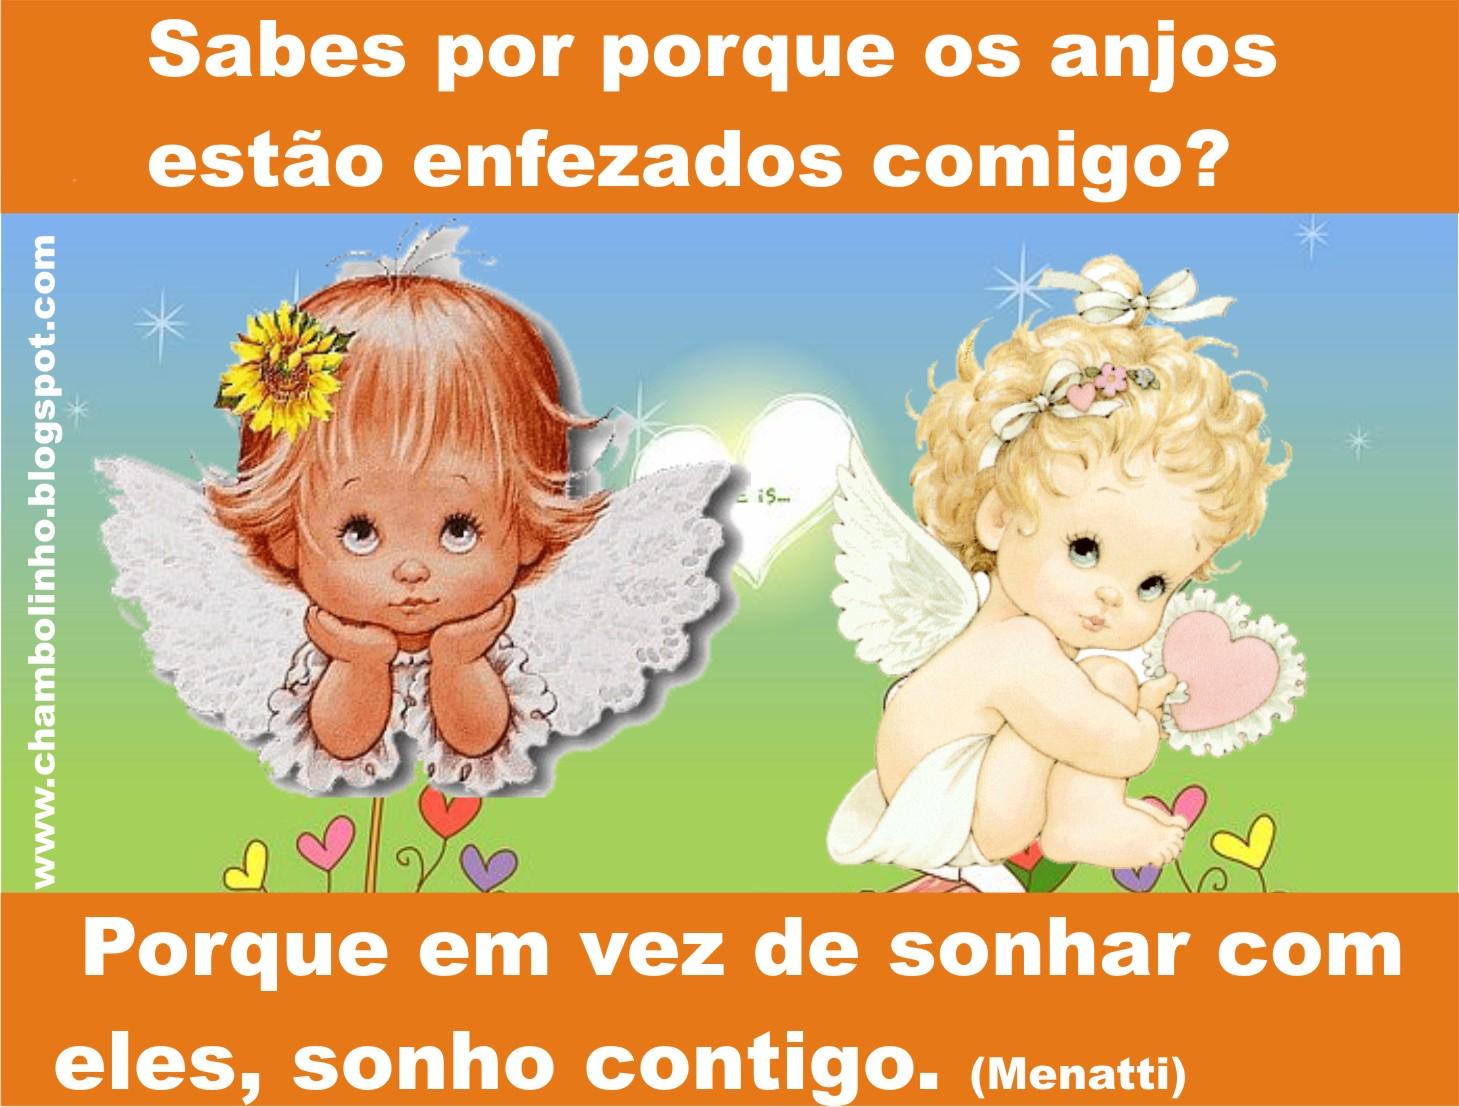 http://1.bp.blogspot.com/-ct3jJ9p33-U/TtLgbHfQg8I/AAAAAAAAEgc/Ywl0s3VZgvY/s1600/boa+noite+amor.jpg